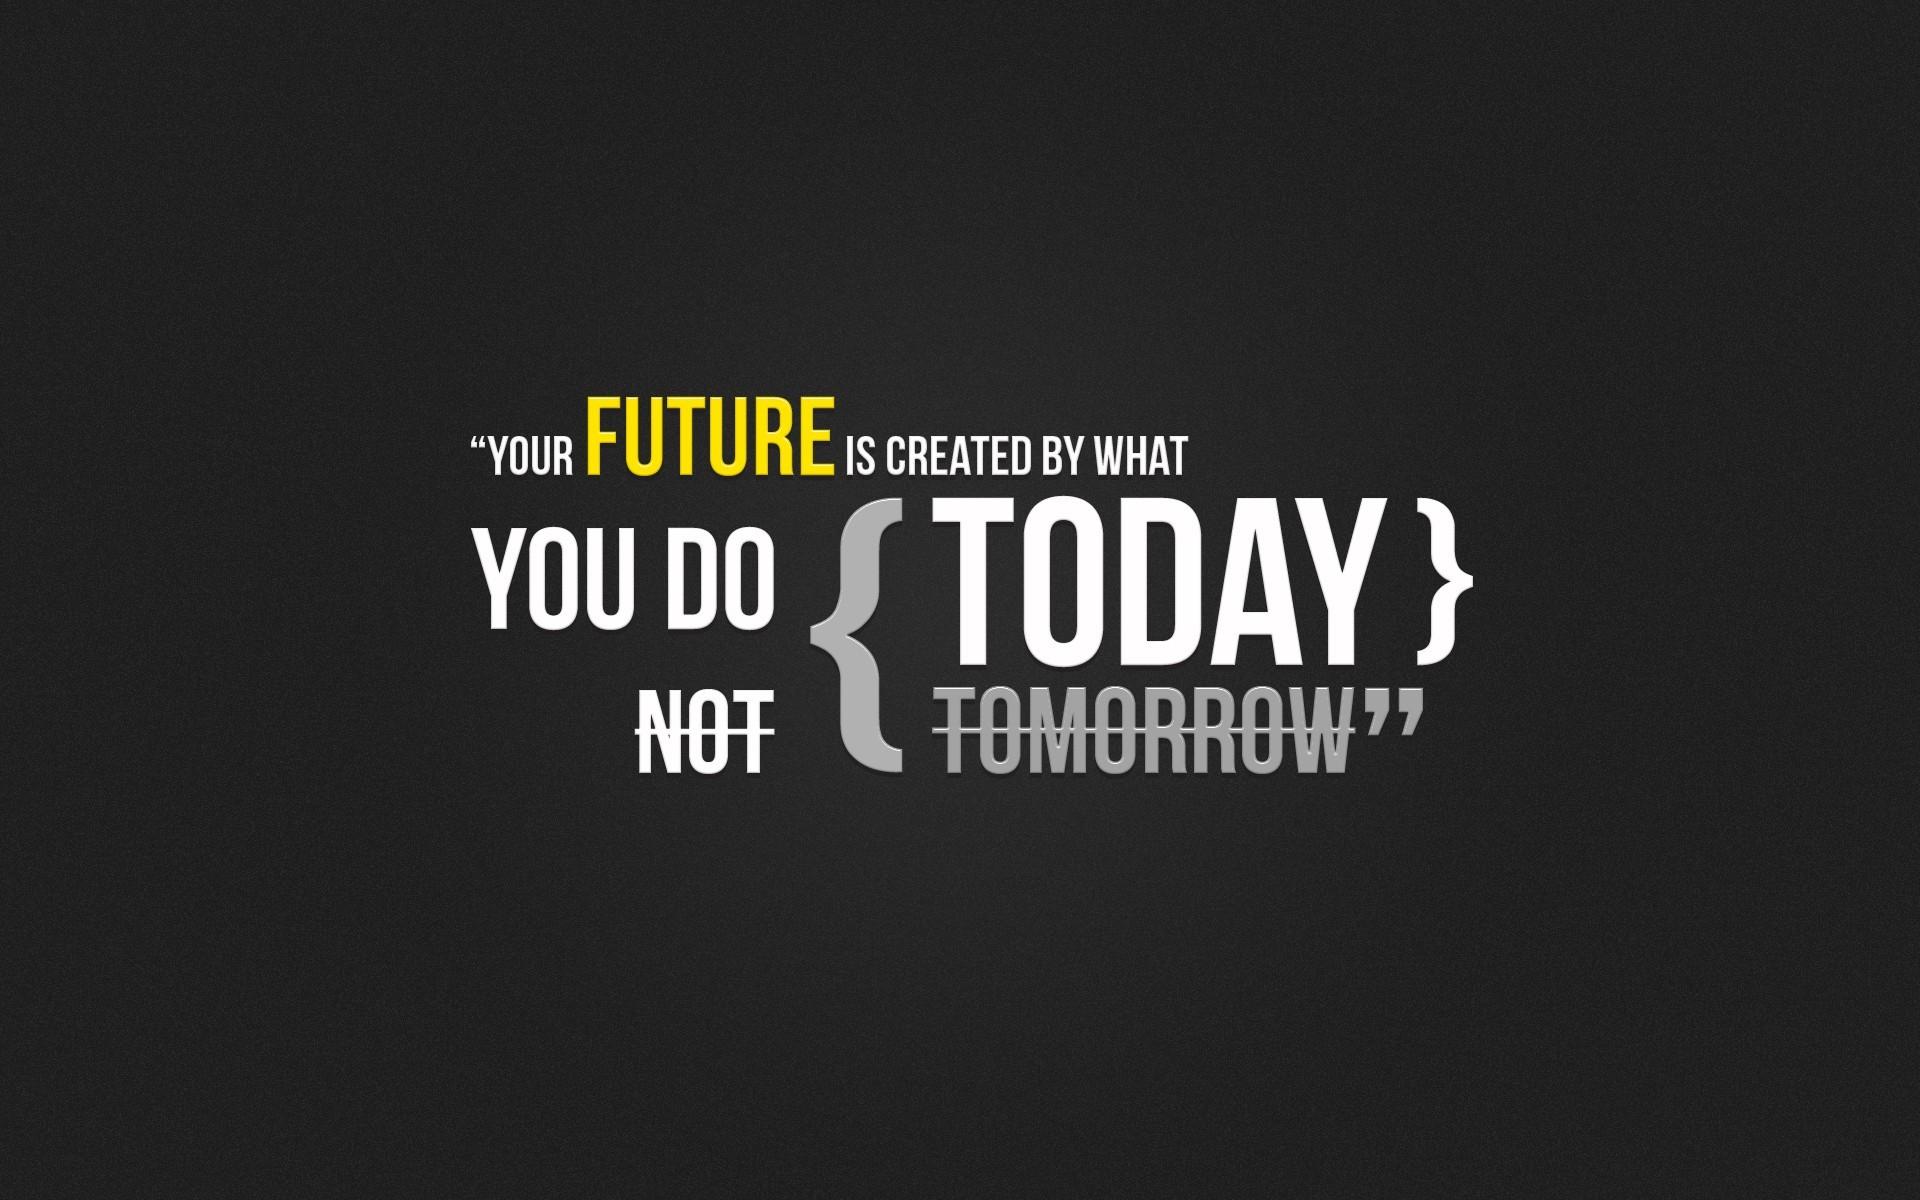 Future, Today, Tomorrow